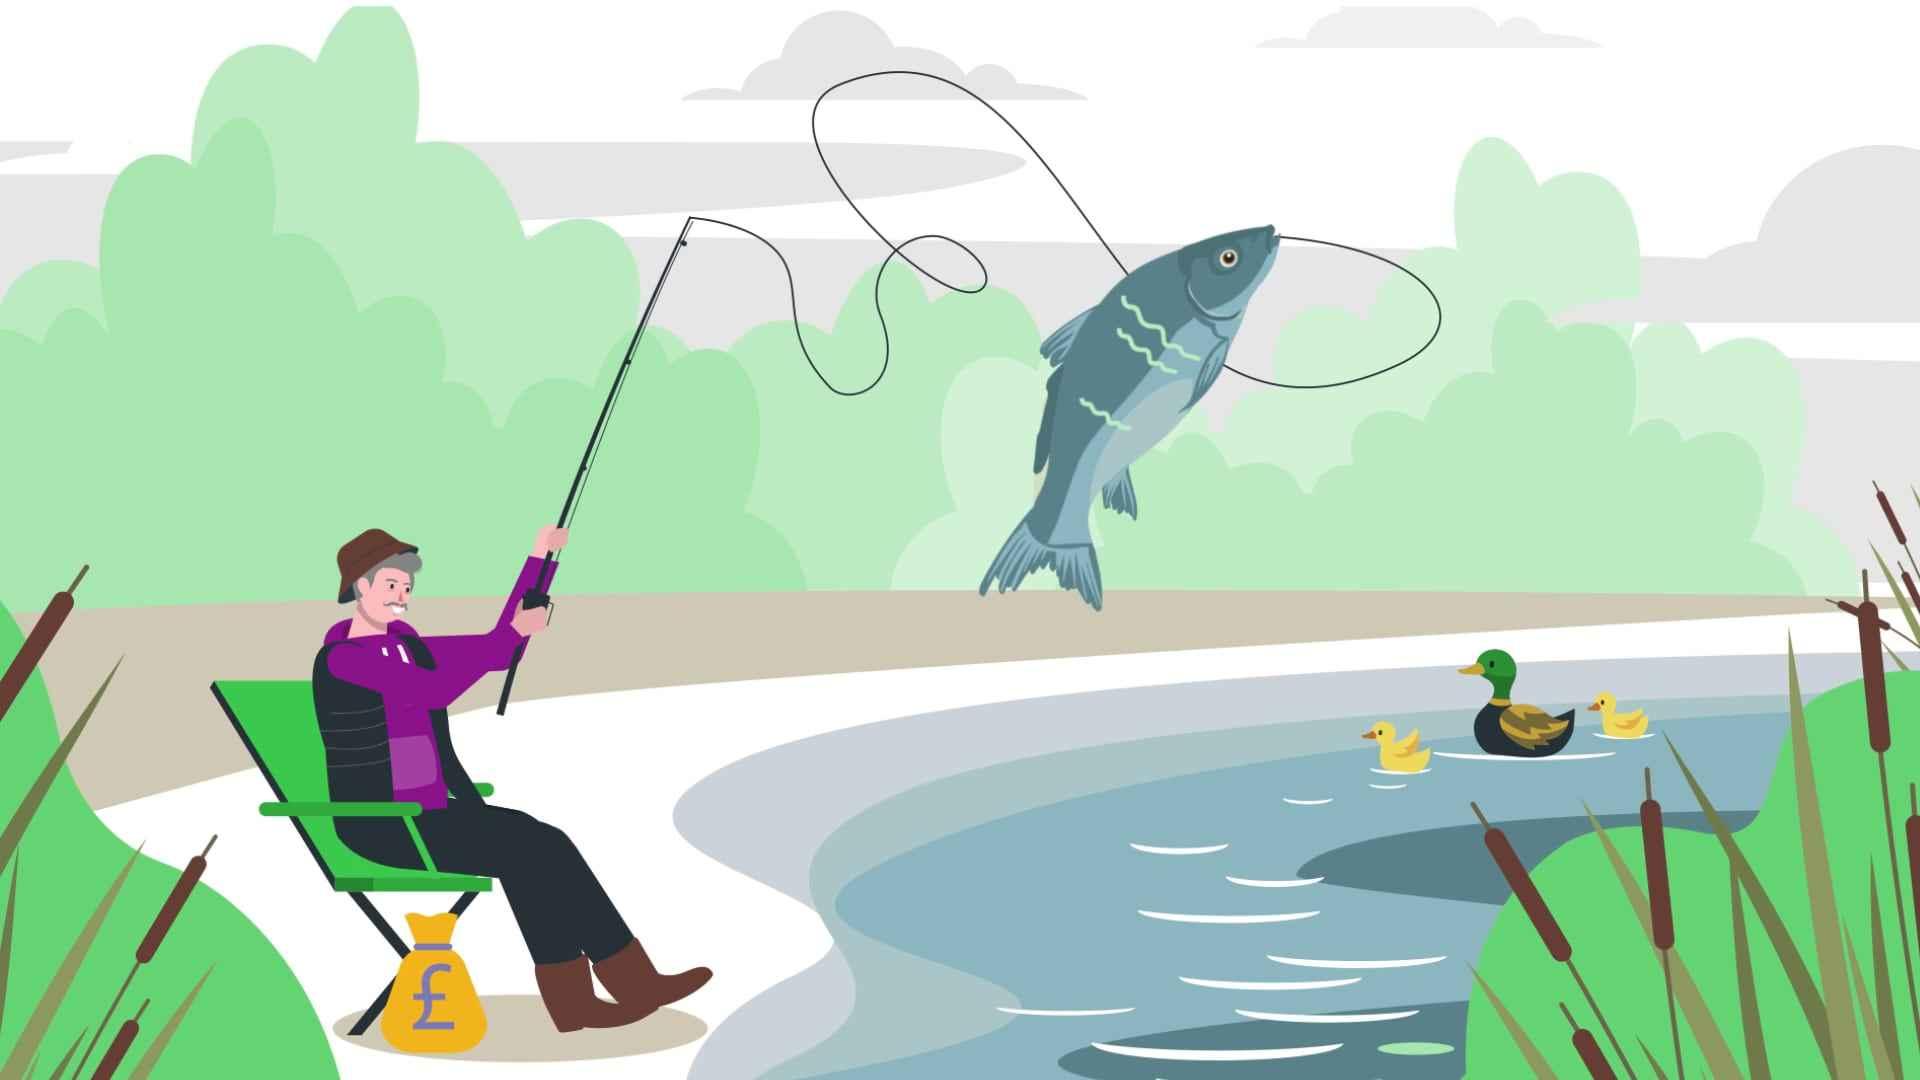 A man caught a big fish - 2D Animation